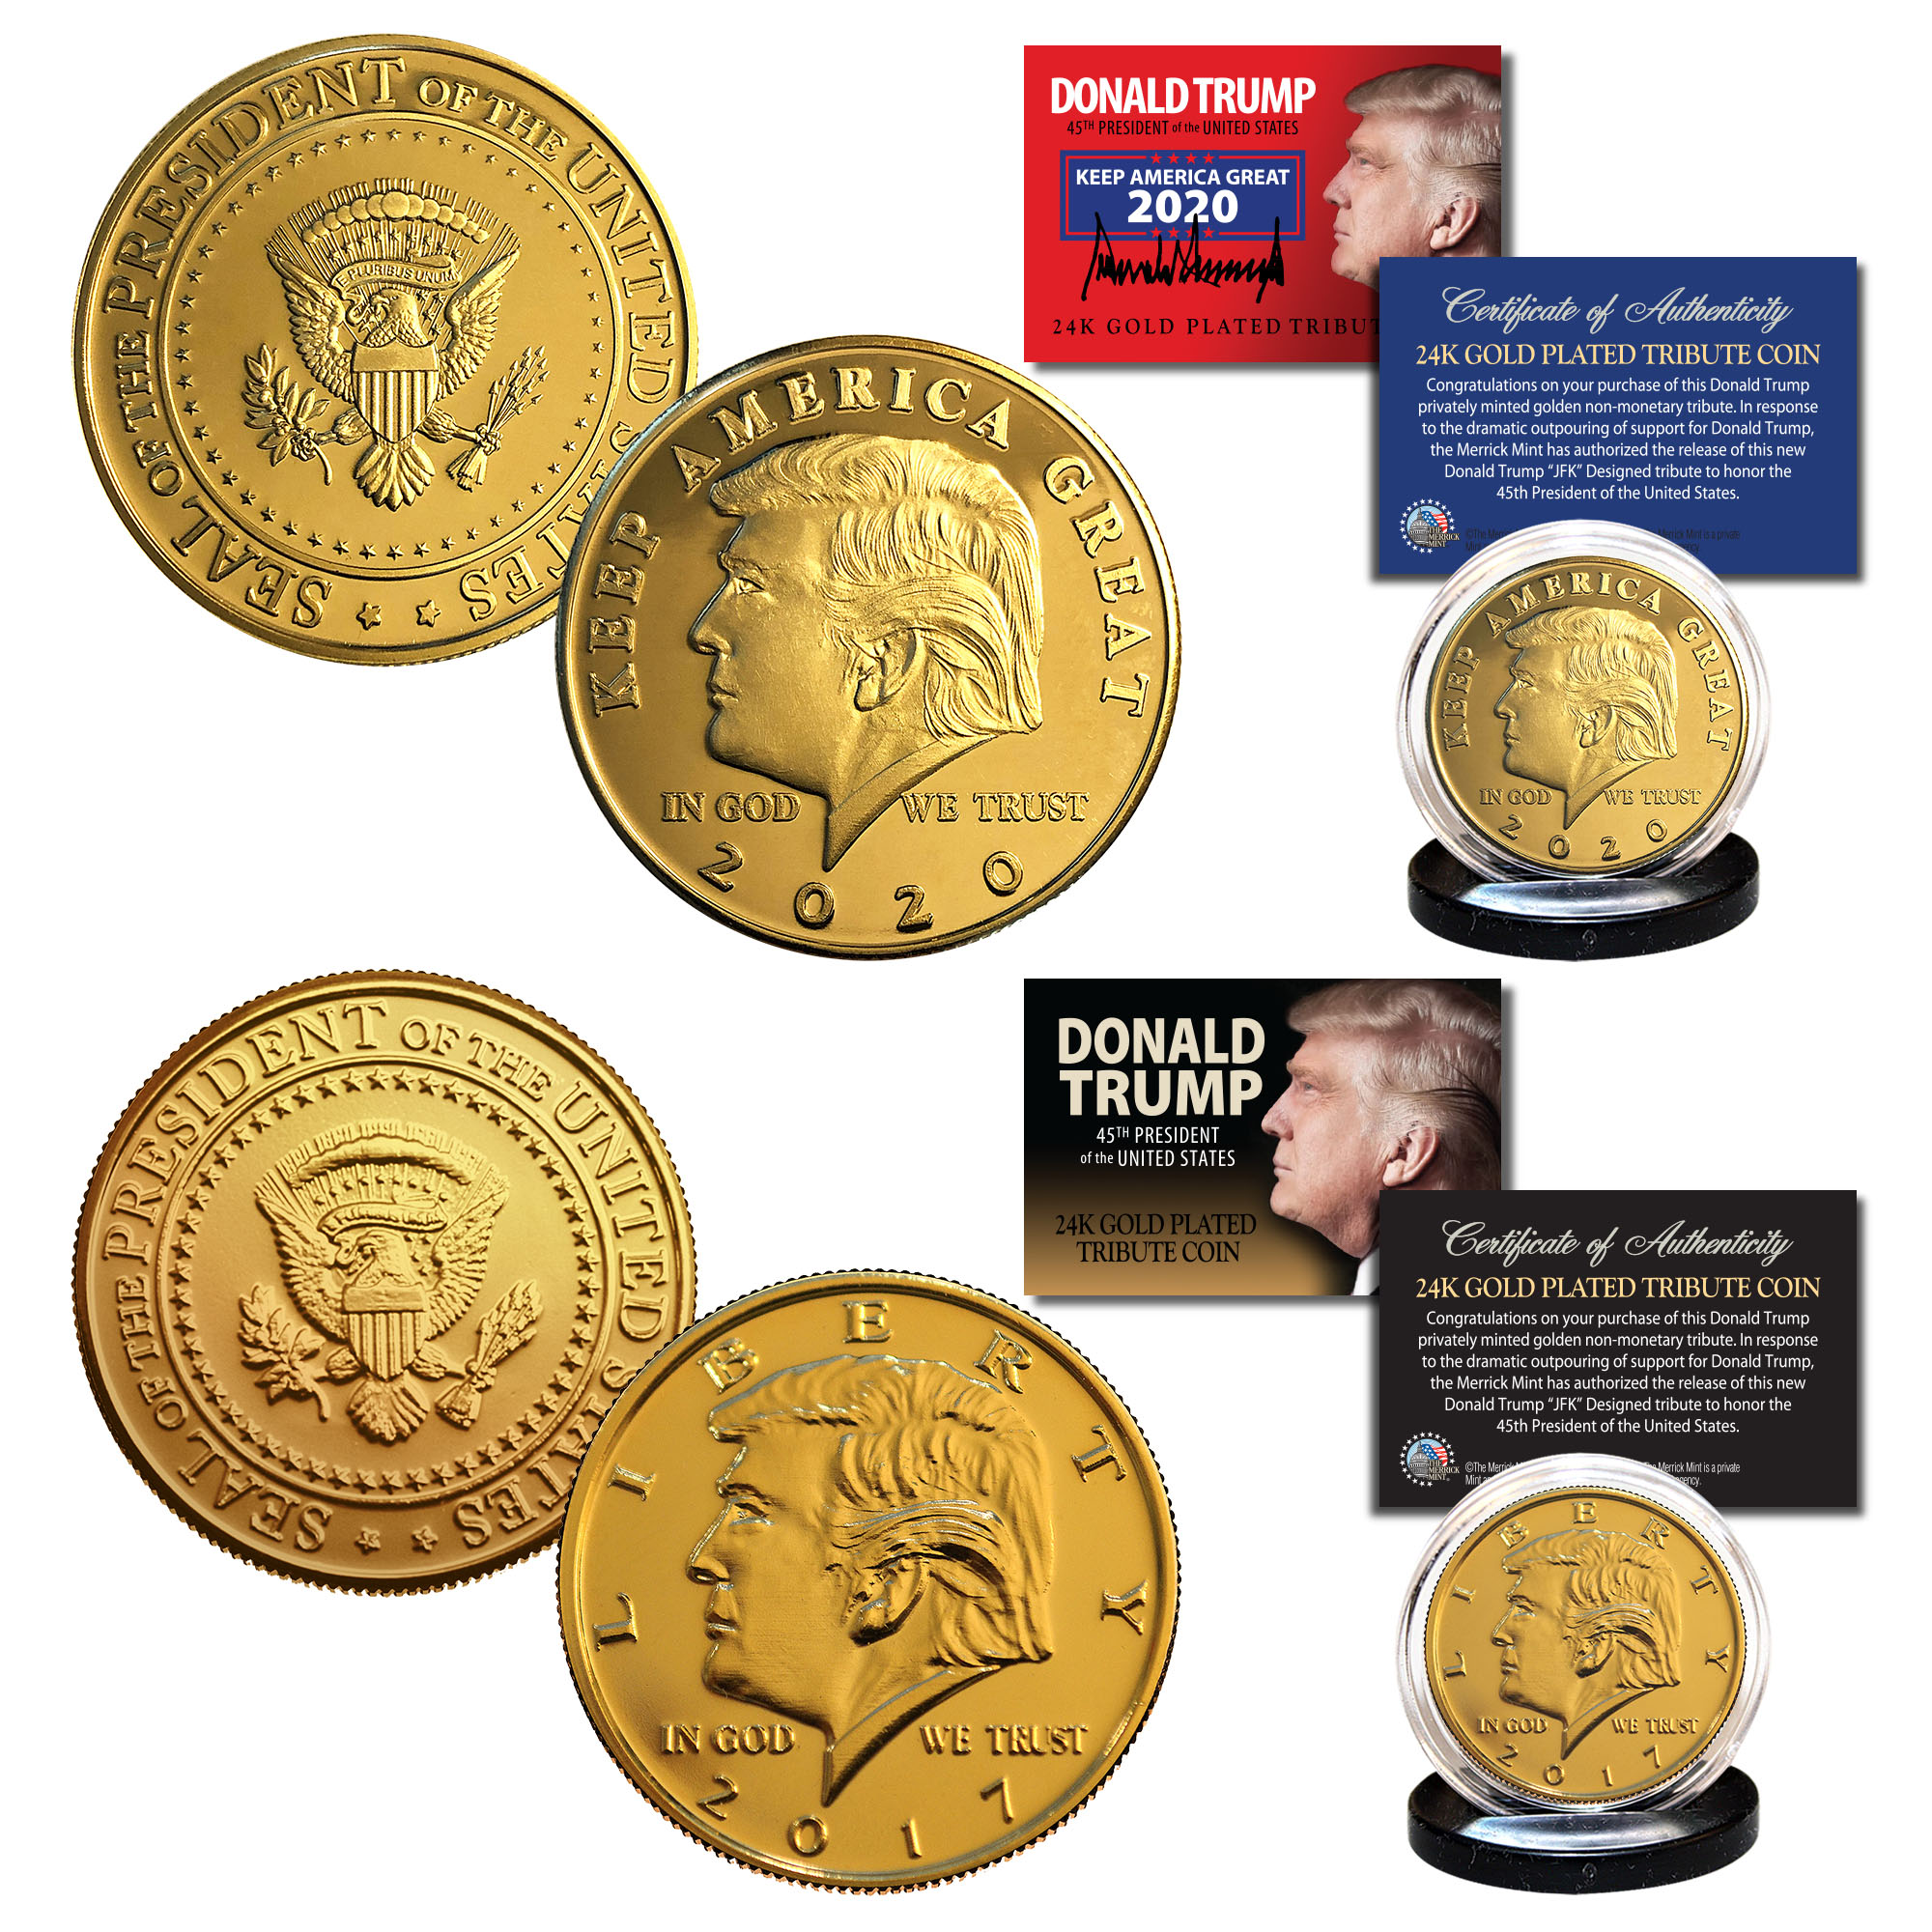 Donald Trump  45th President of USA     24K GOLD  PLATED MEMORABILIA COIN #1